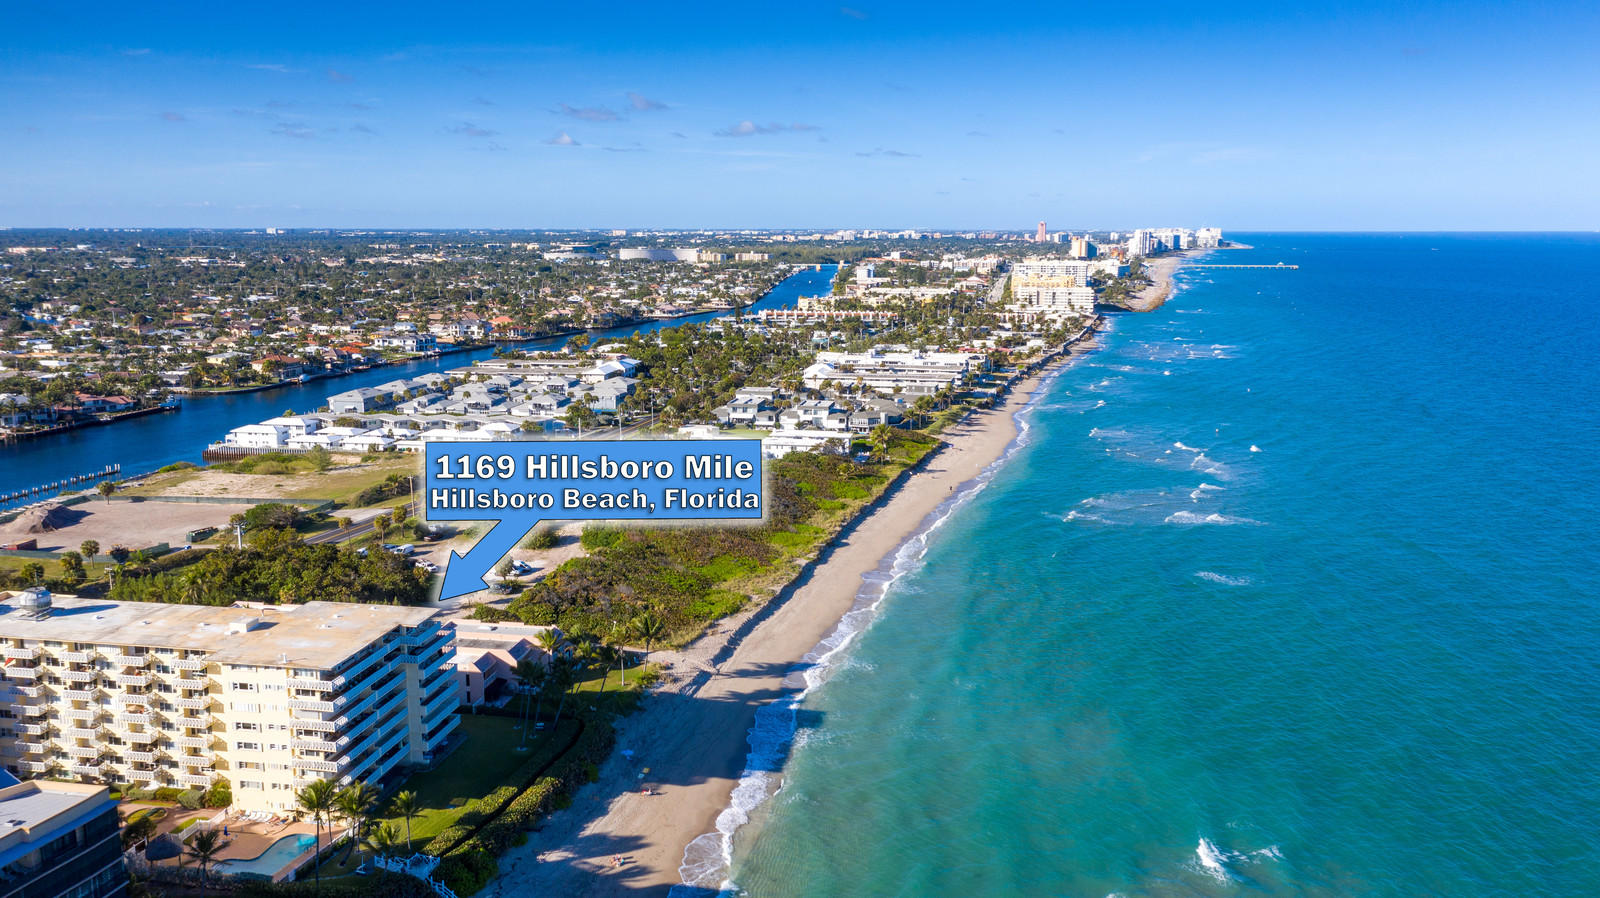 1169 Hillsboro Mile, Hillsboro Beach, Florida 33062, 2 Bedrooms Bedrooms, ,2 BathroomsBathrooms,Residential,For Sale,Hillsboro Mile,RX-10592995